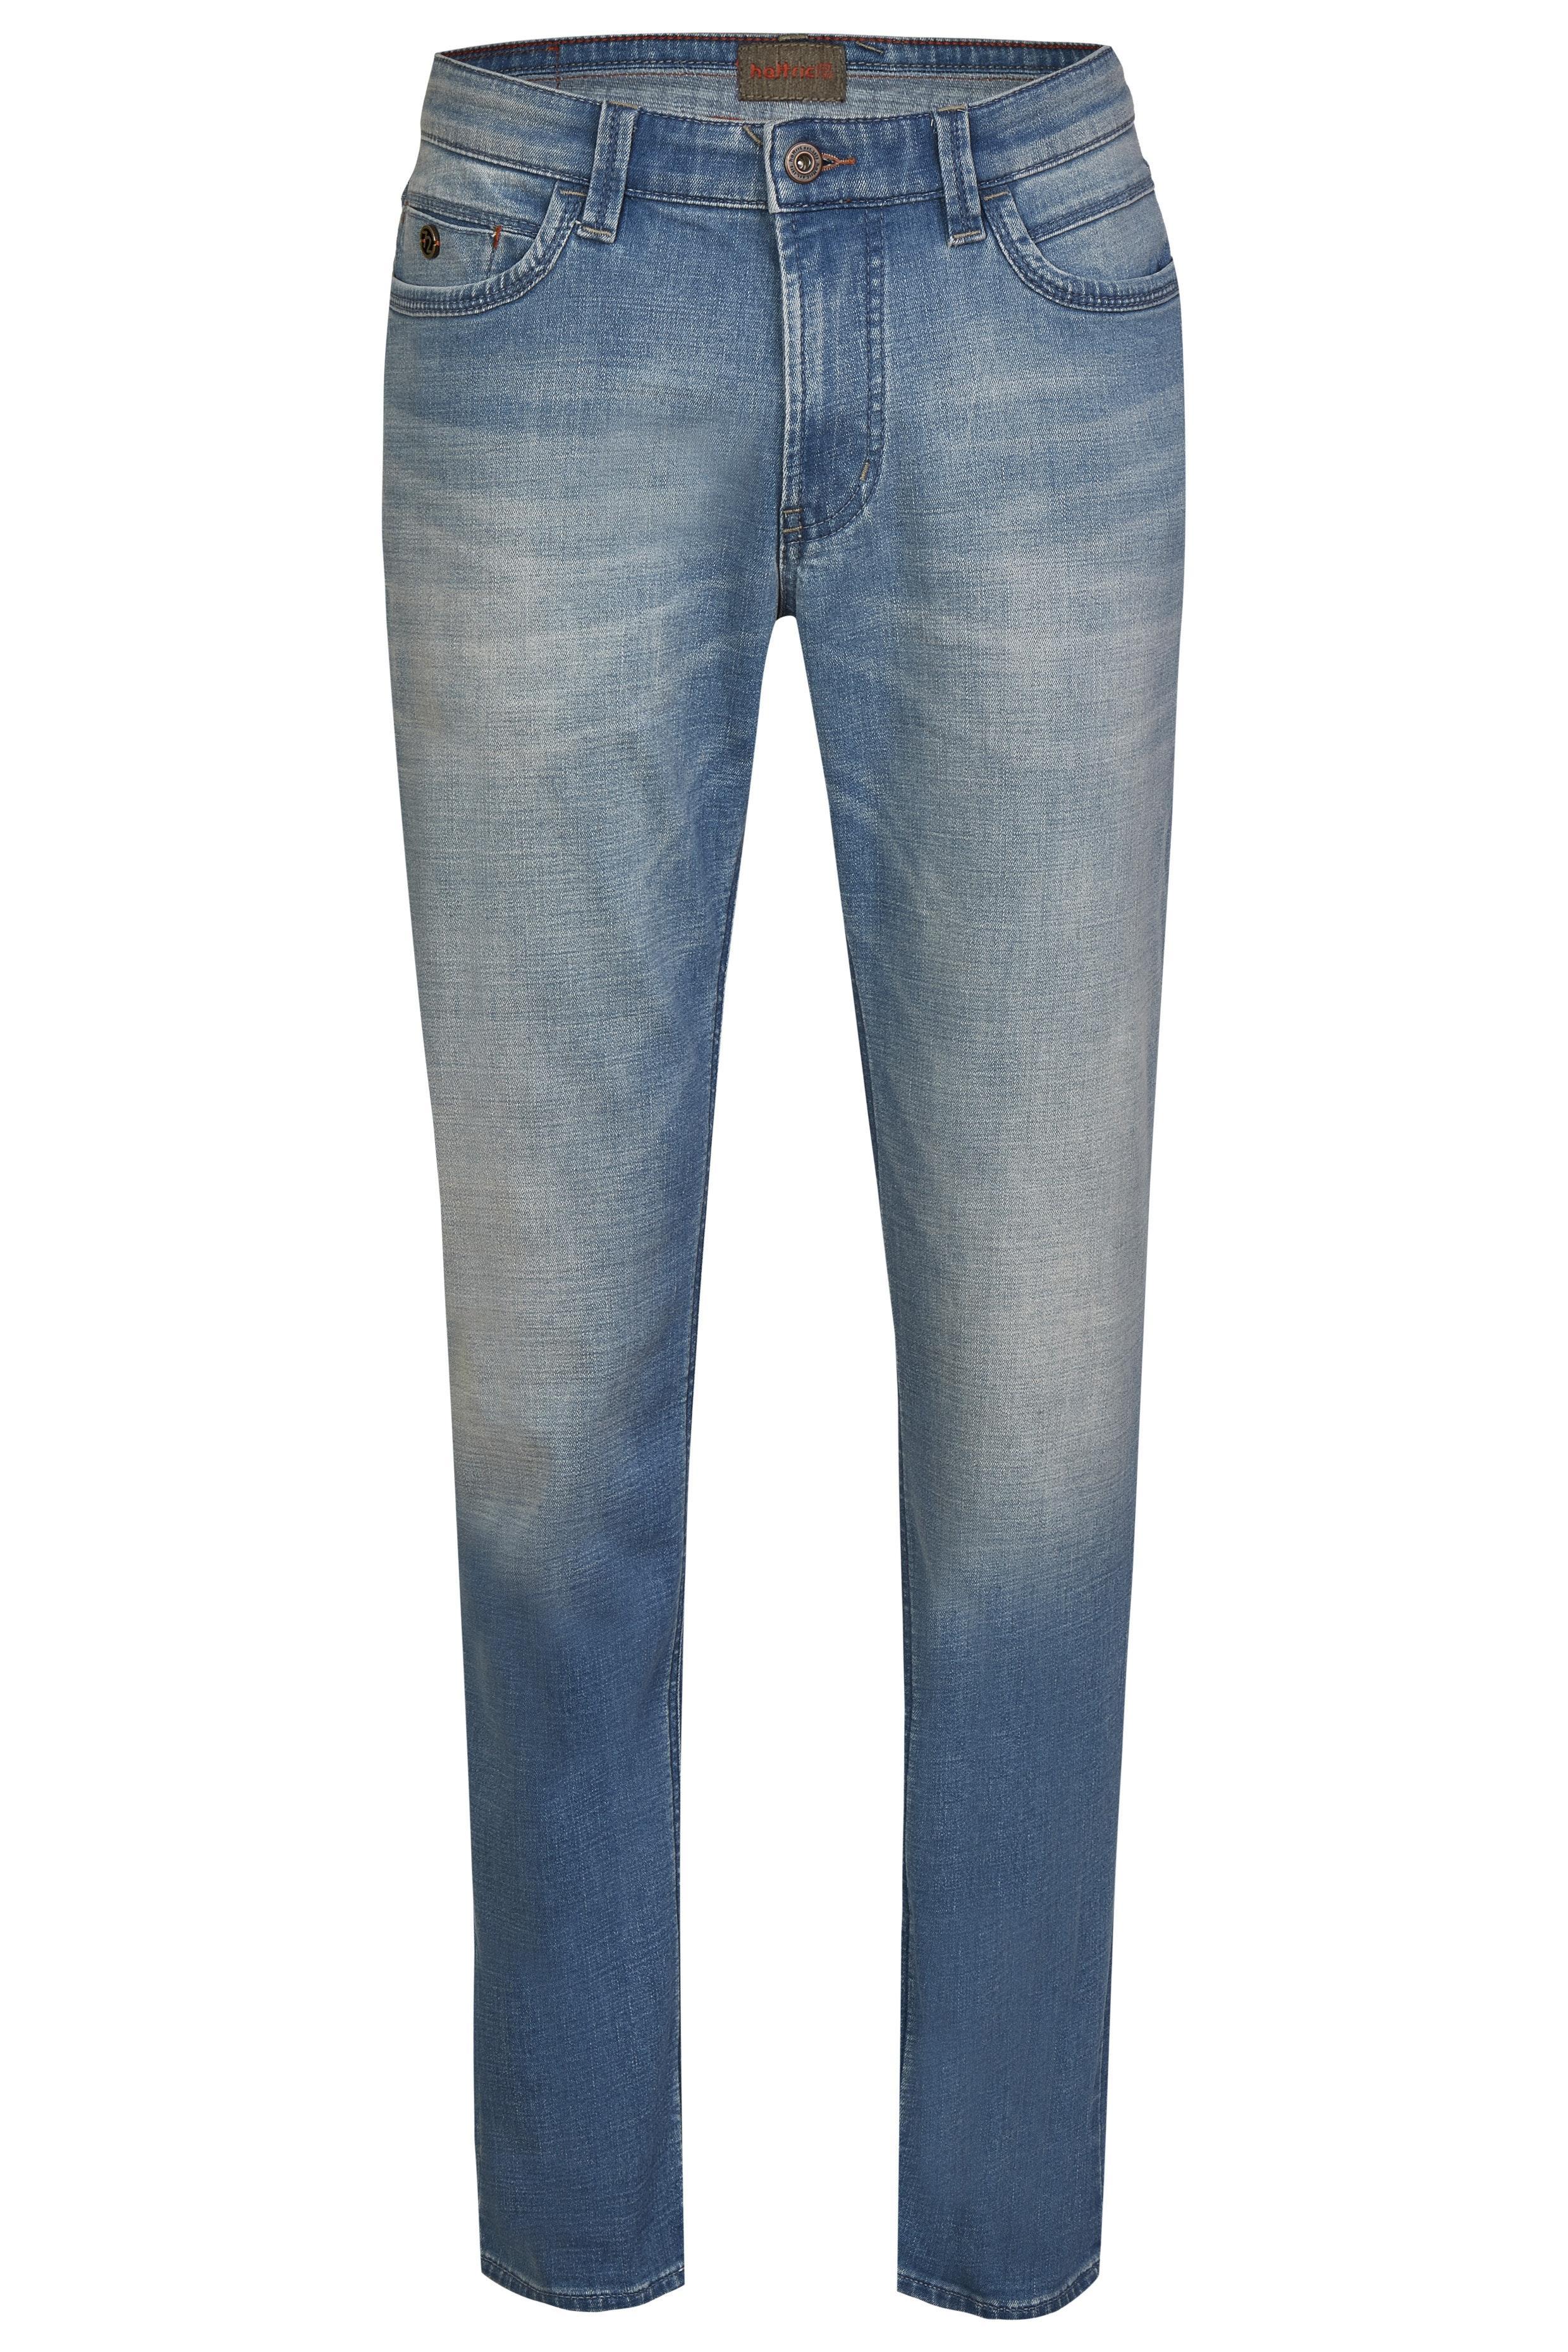 HATTRIC Jeans Harris